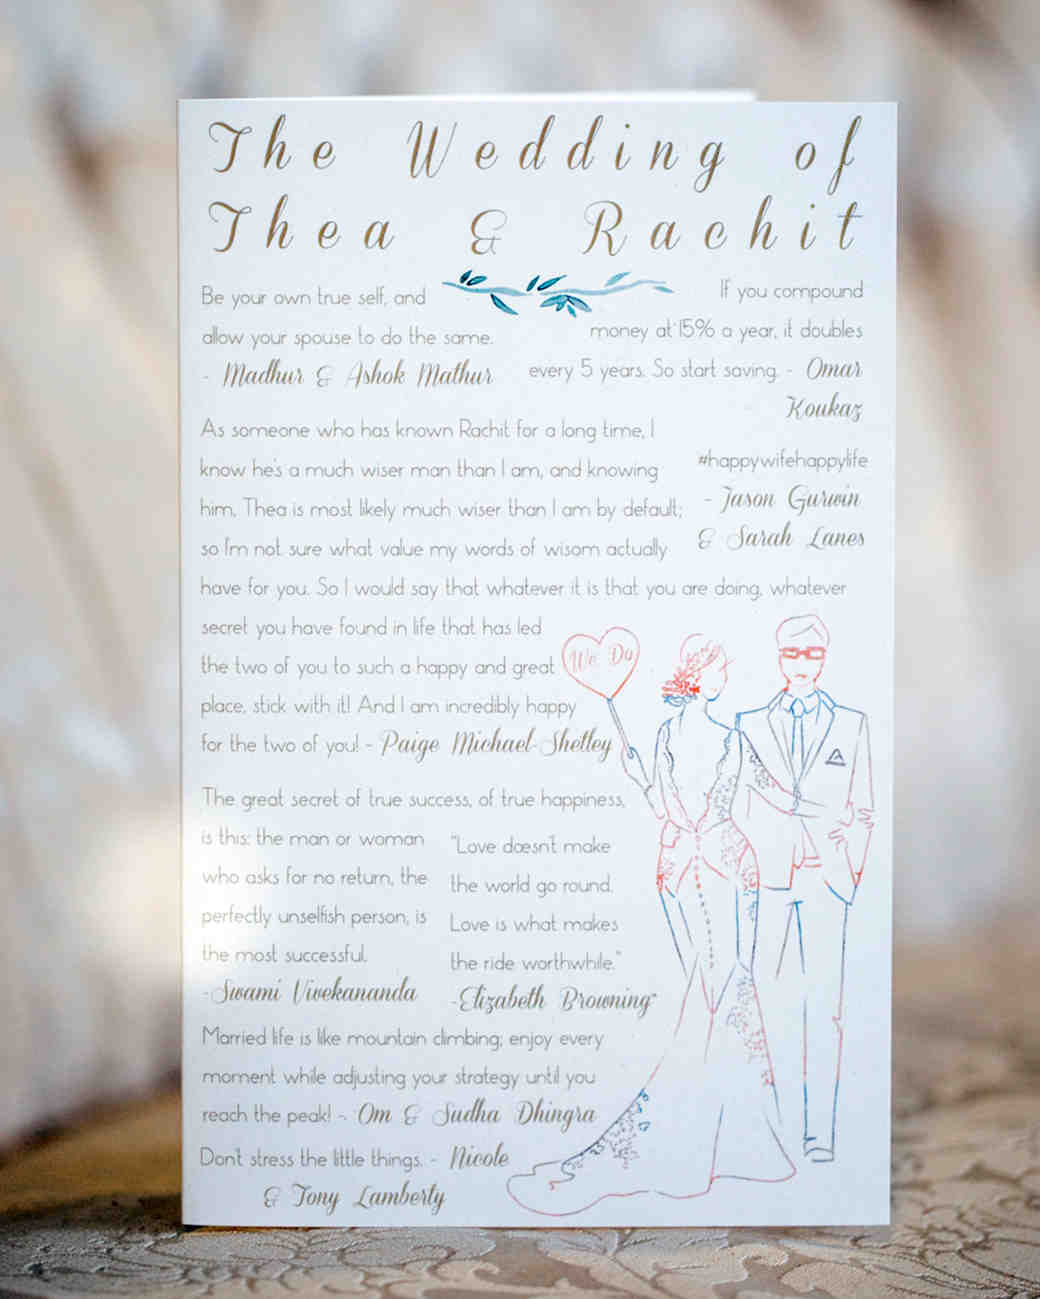 thea-rachit-wedding-progam-0020-s112016-0715.jpg